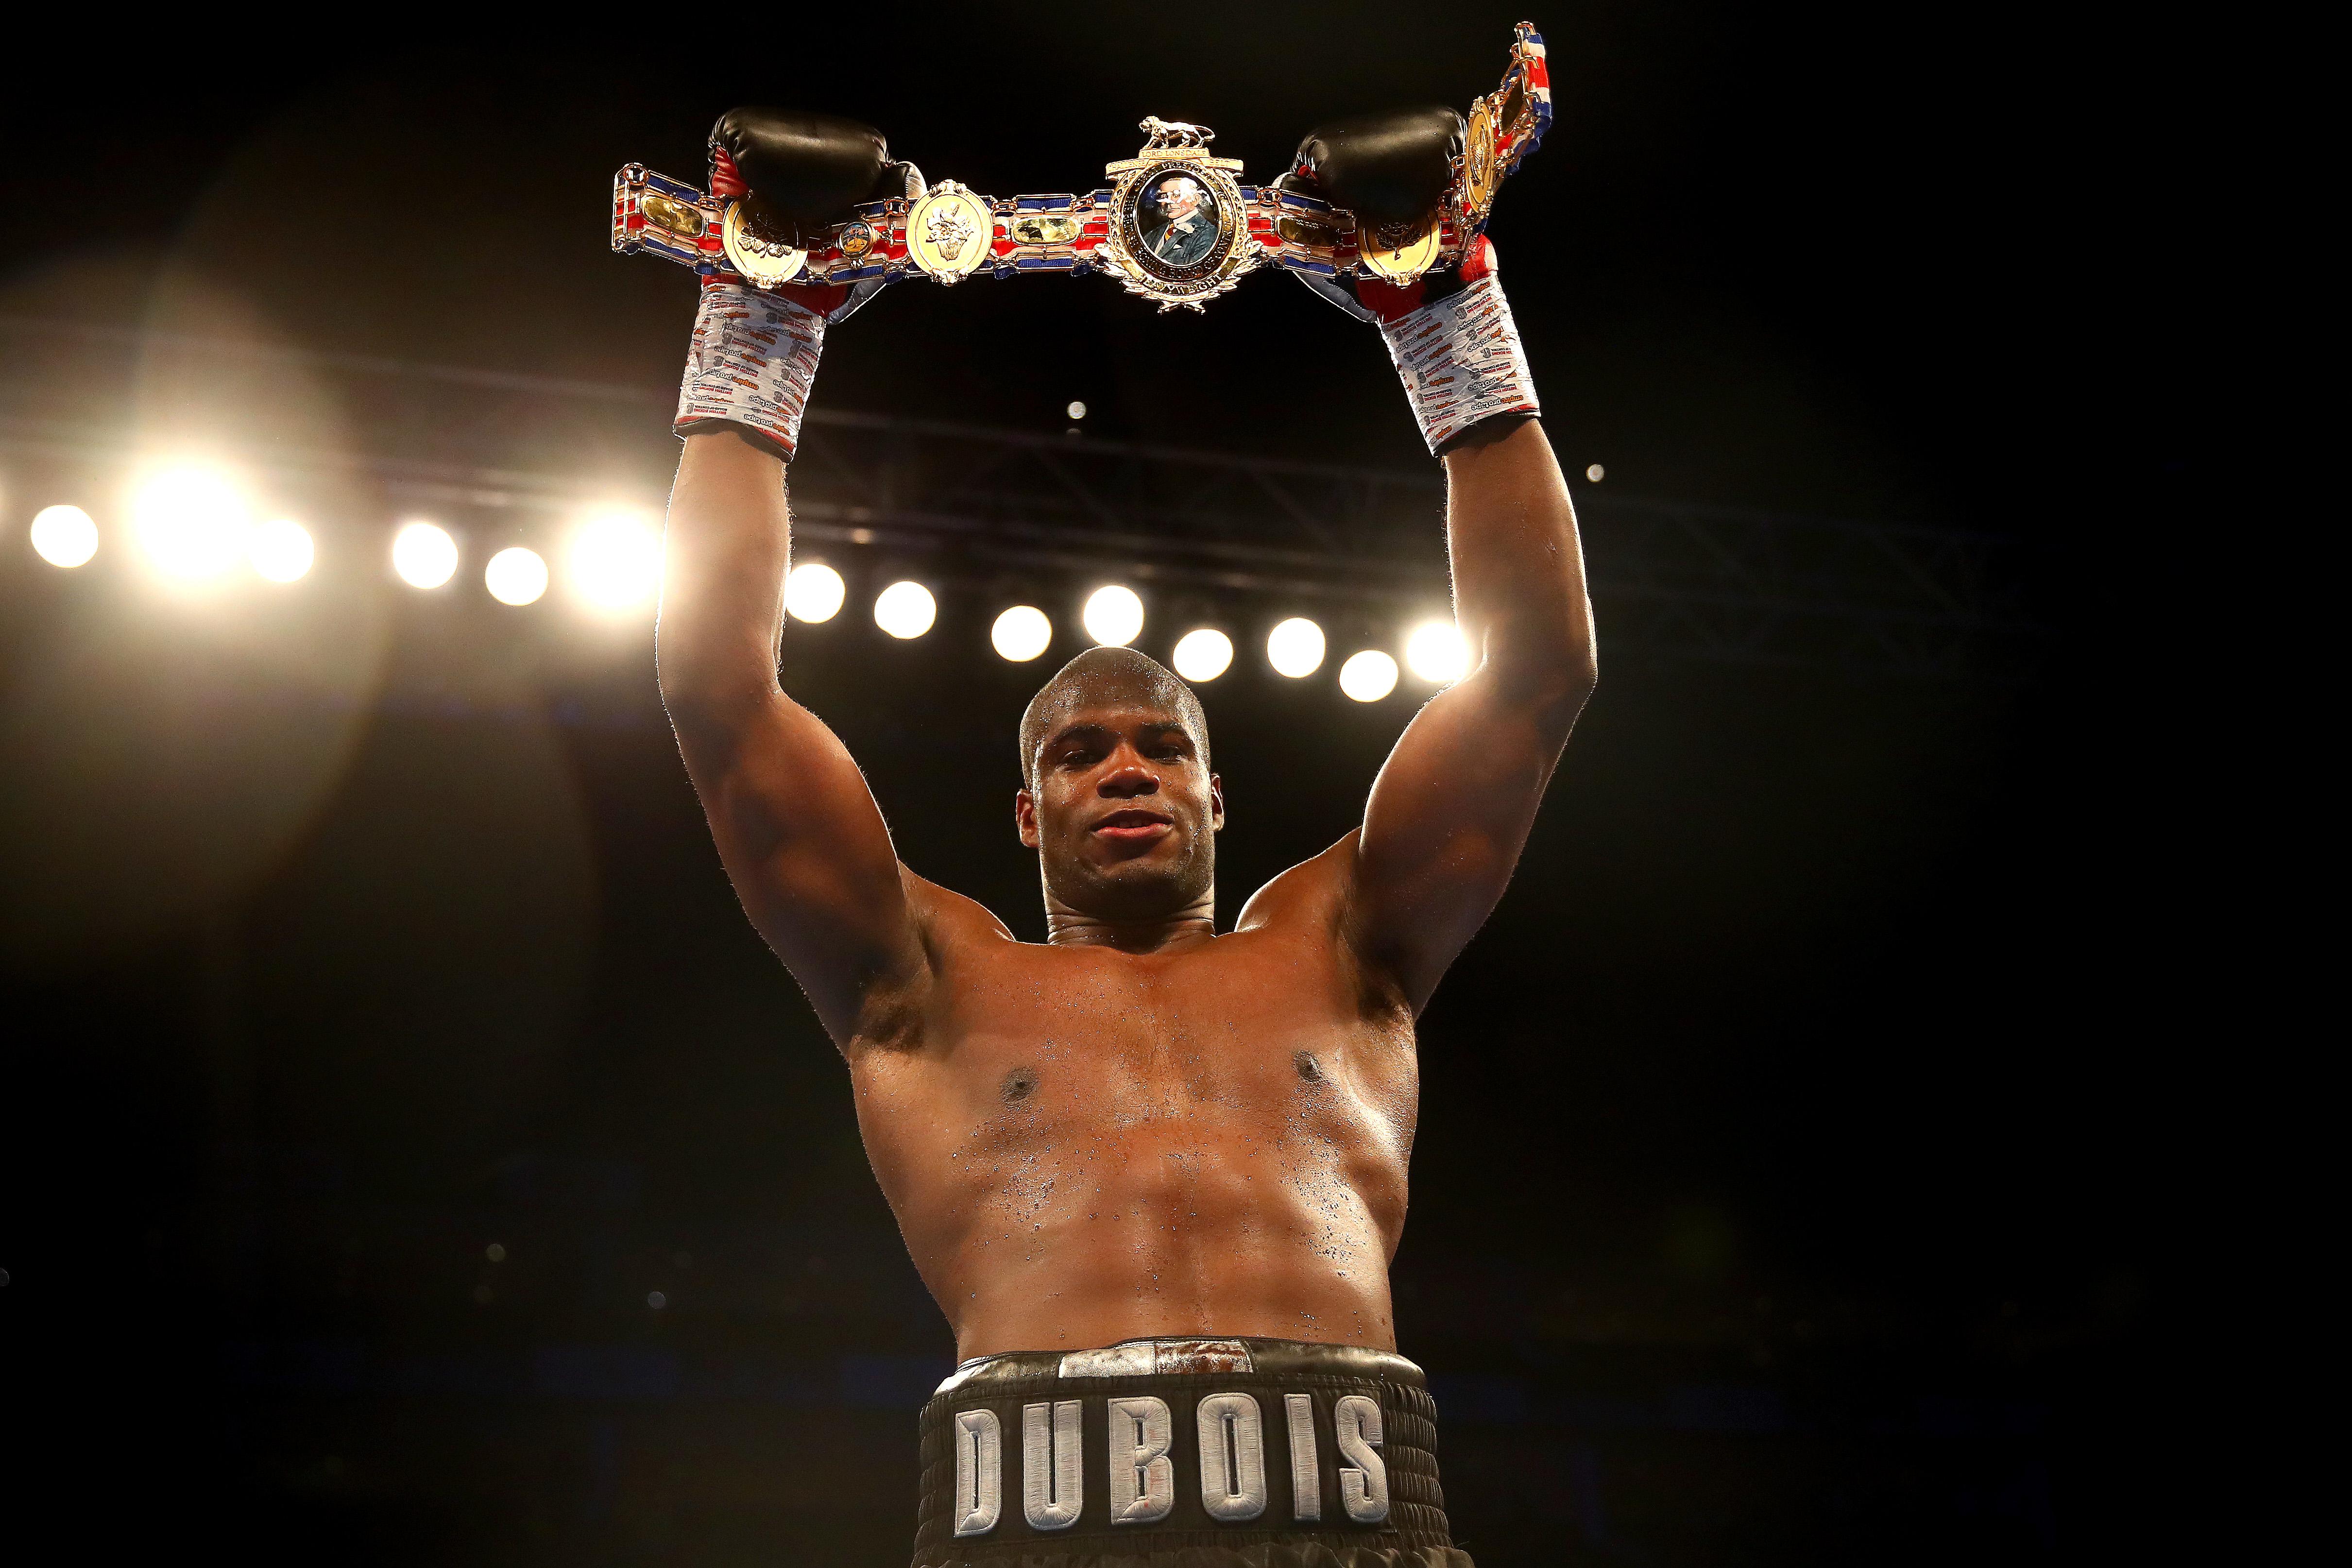 At just 21, Dubois is already British champion